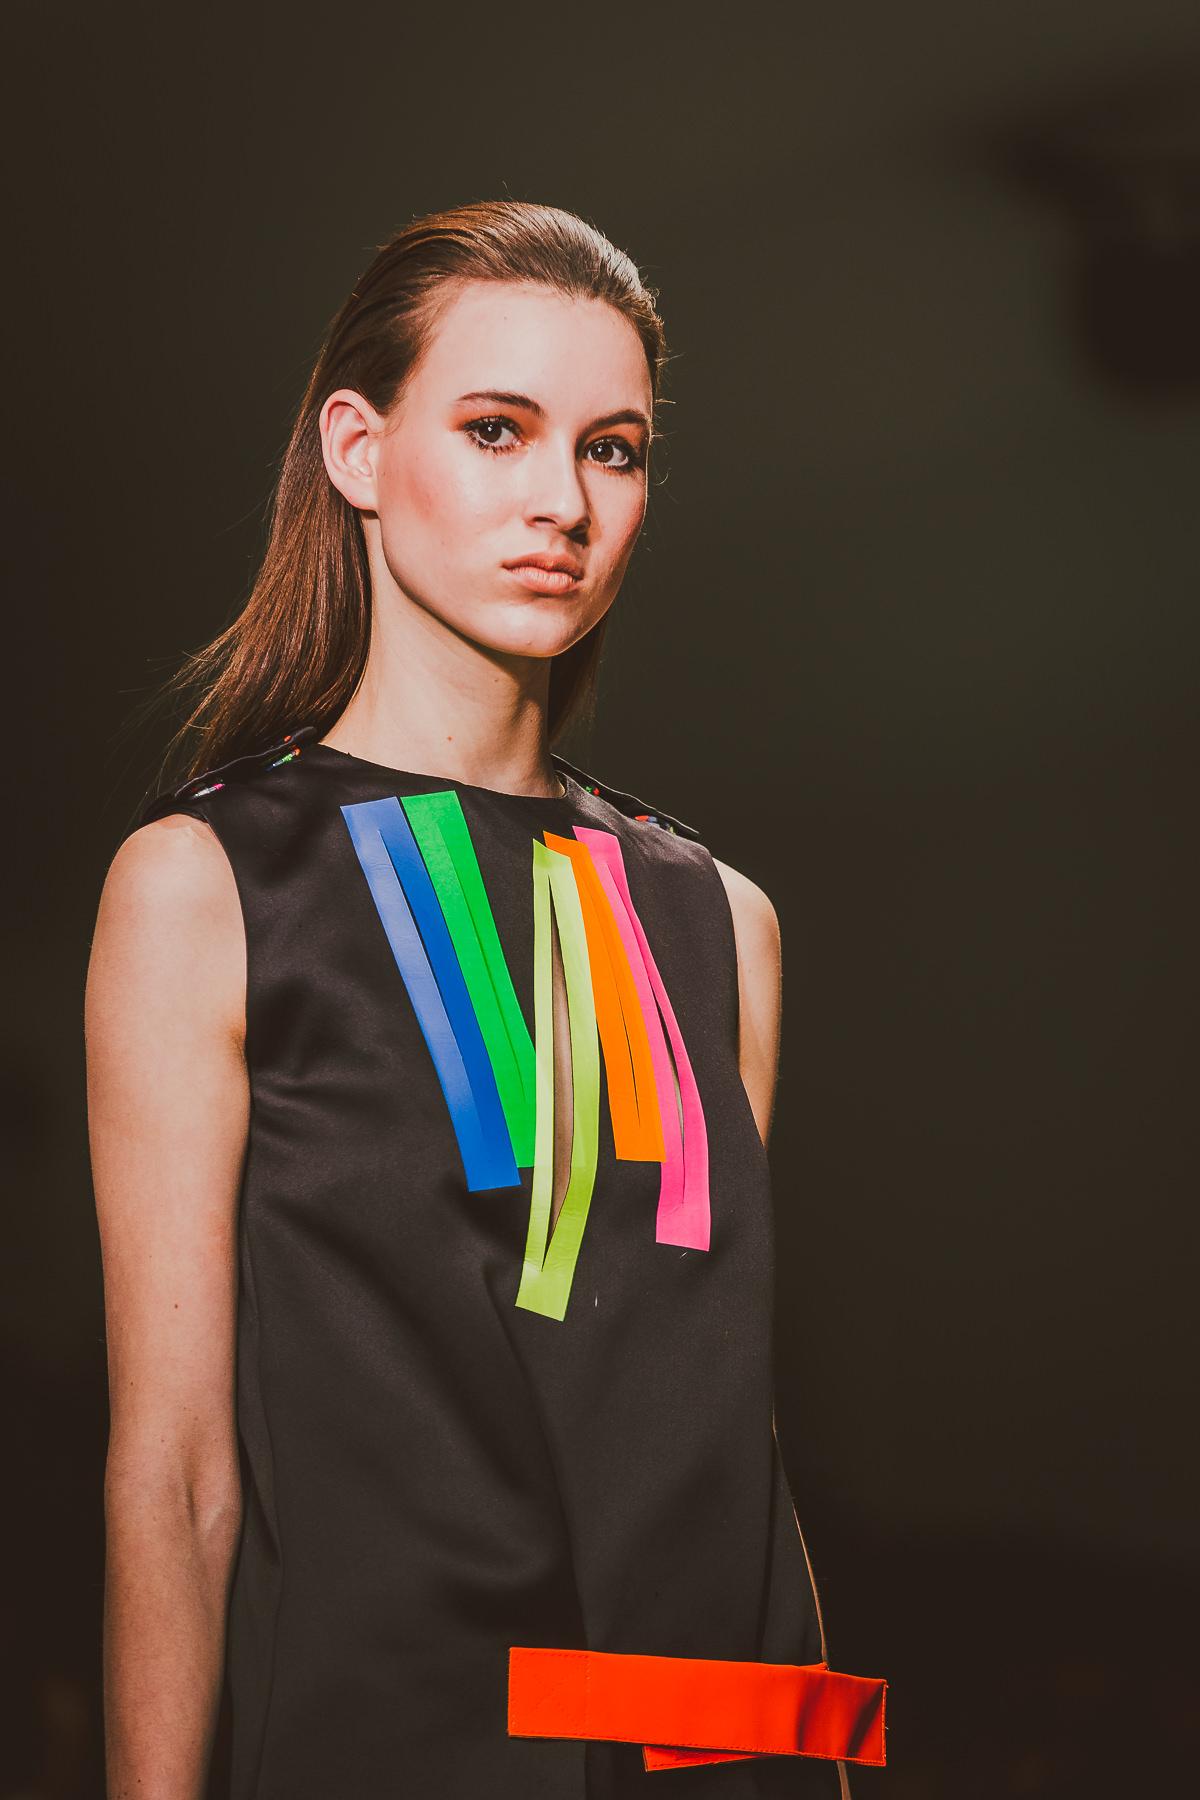 015 - London Fashion Week